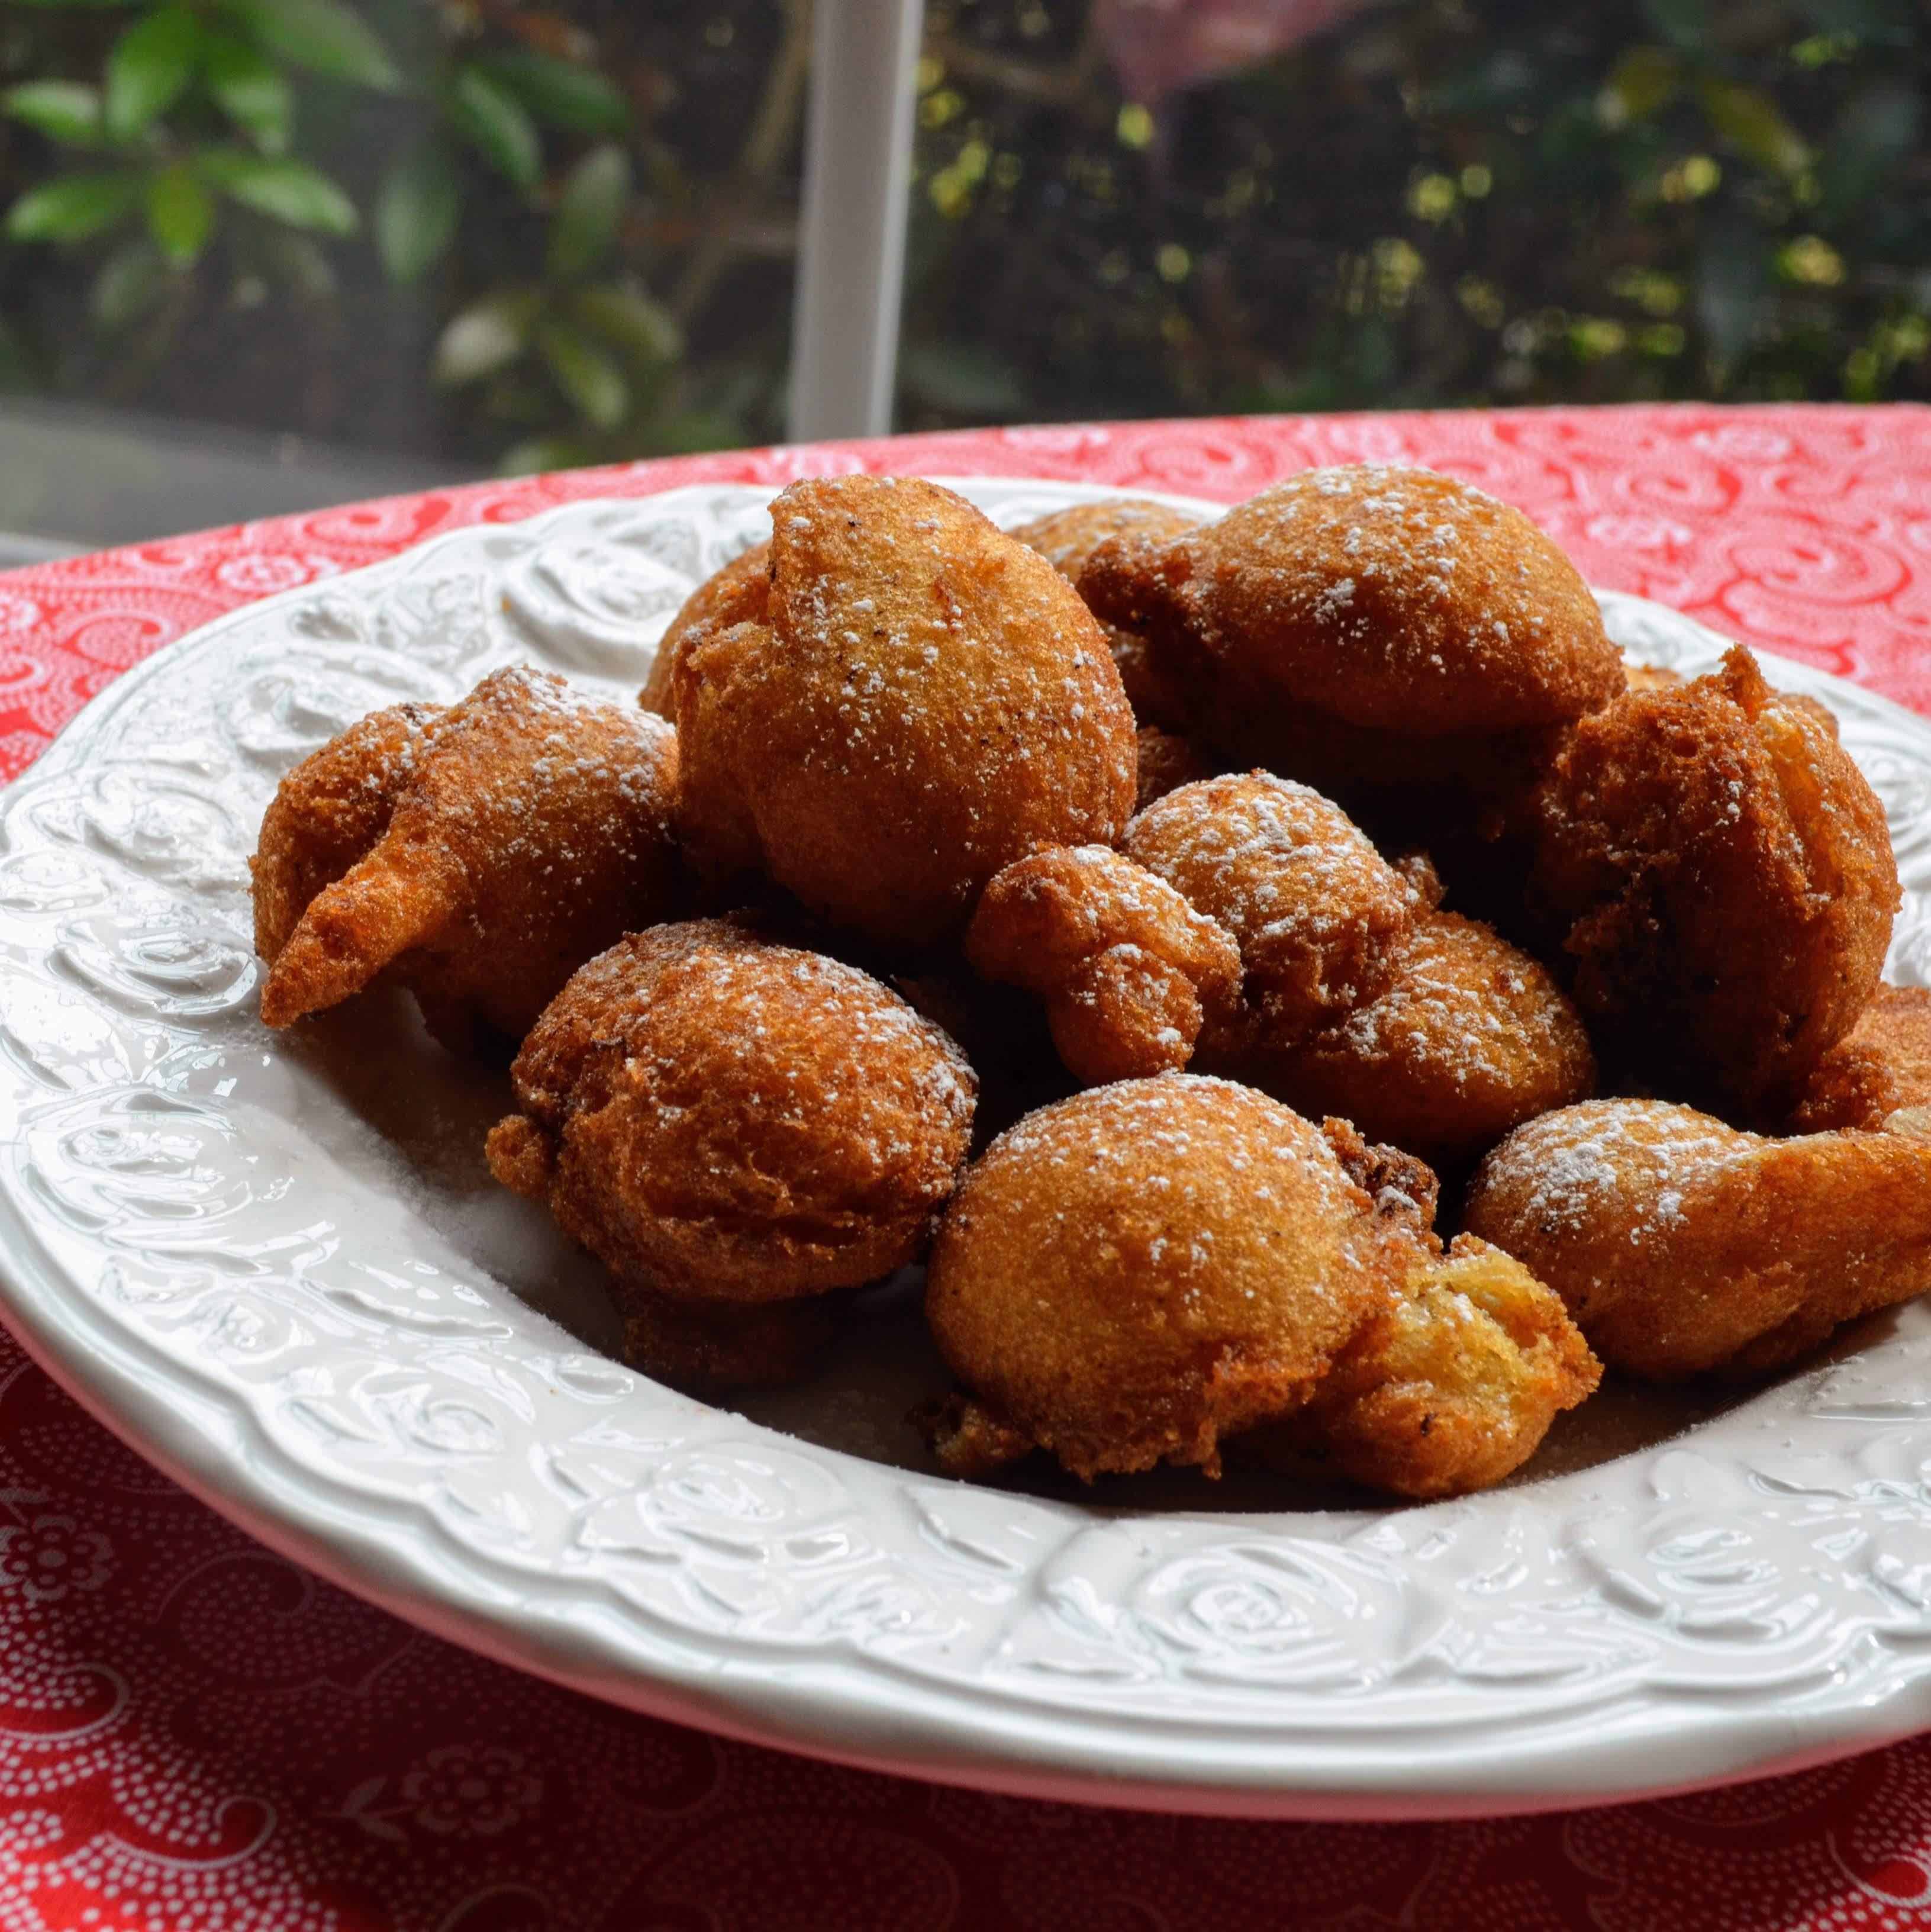 Grandma's Cake Doughnuts